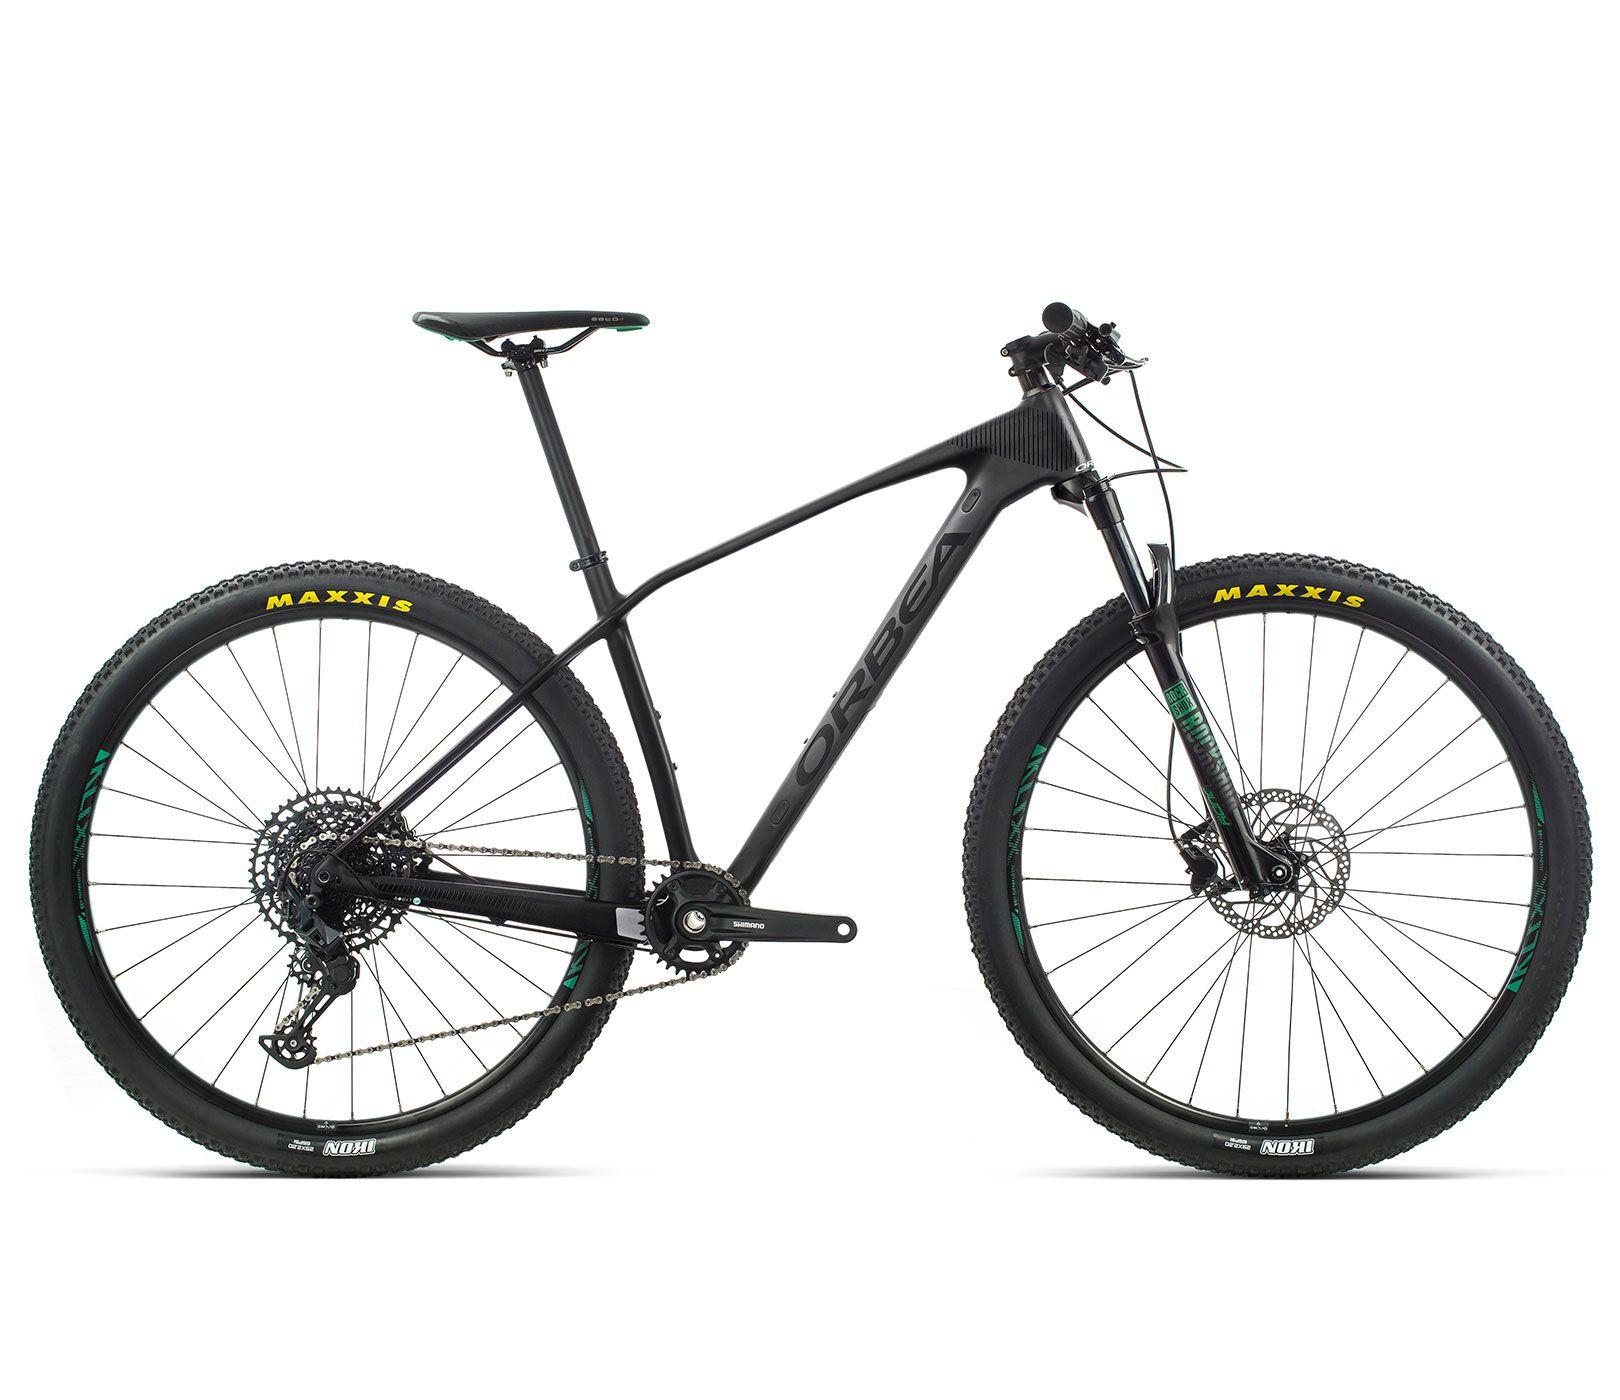 Bicicleta MTB Orbea Alma 29 M50 - Tam L - Preta 2020